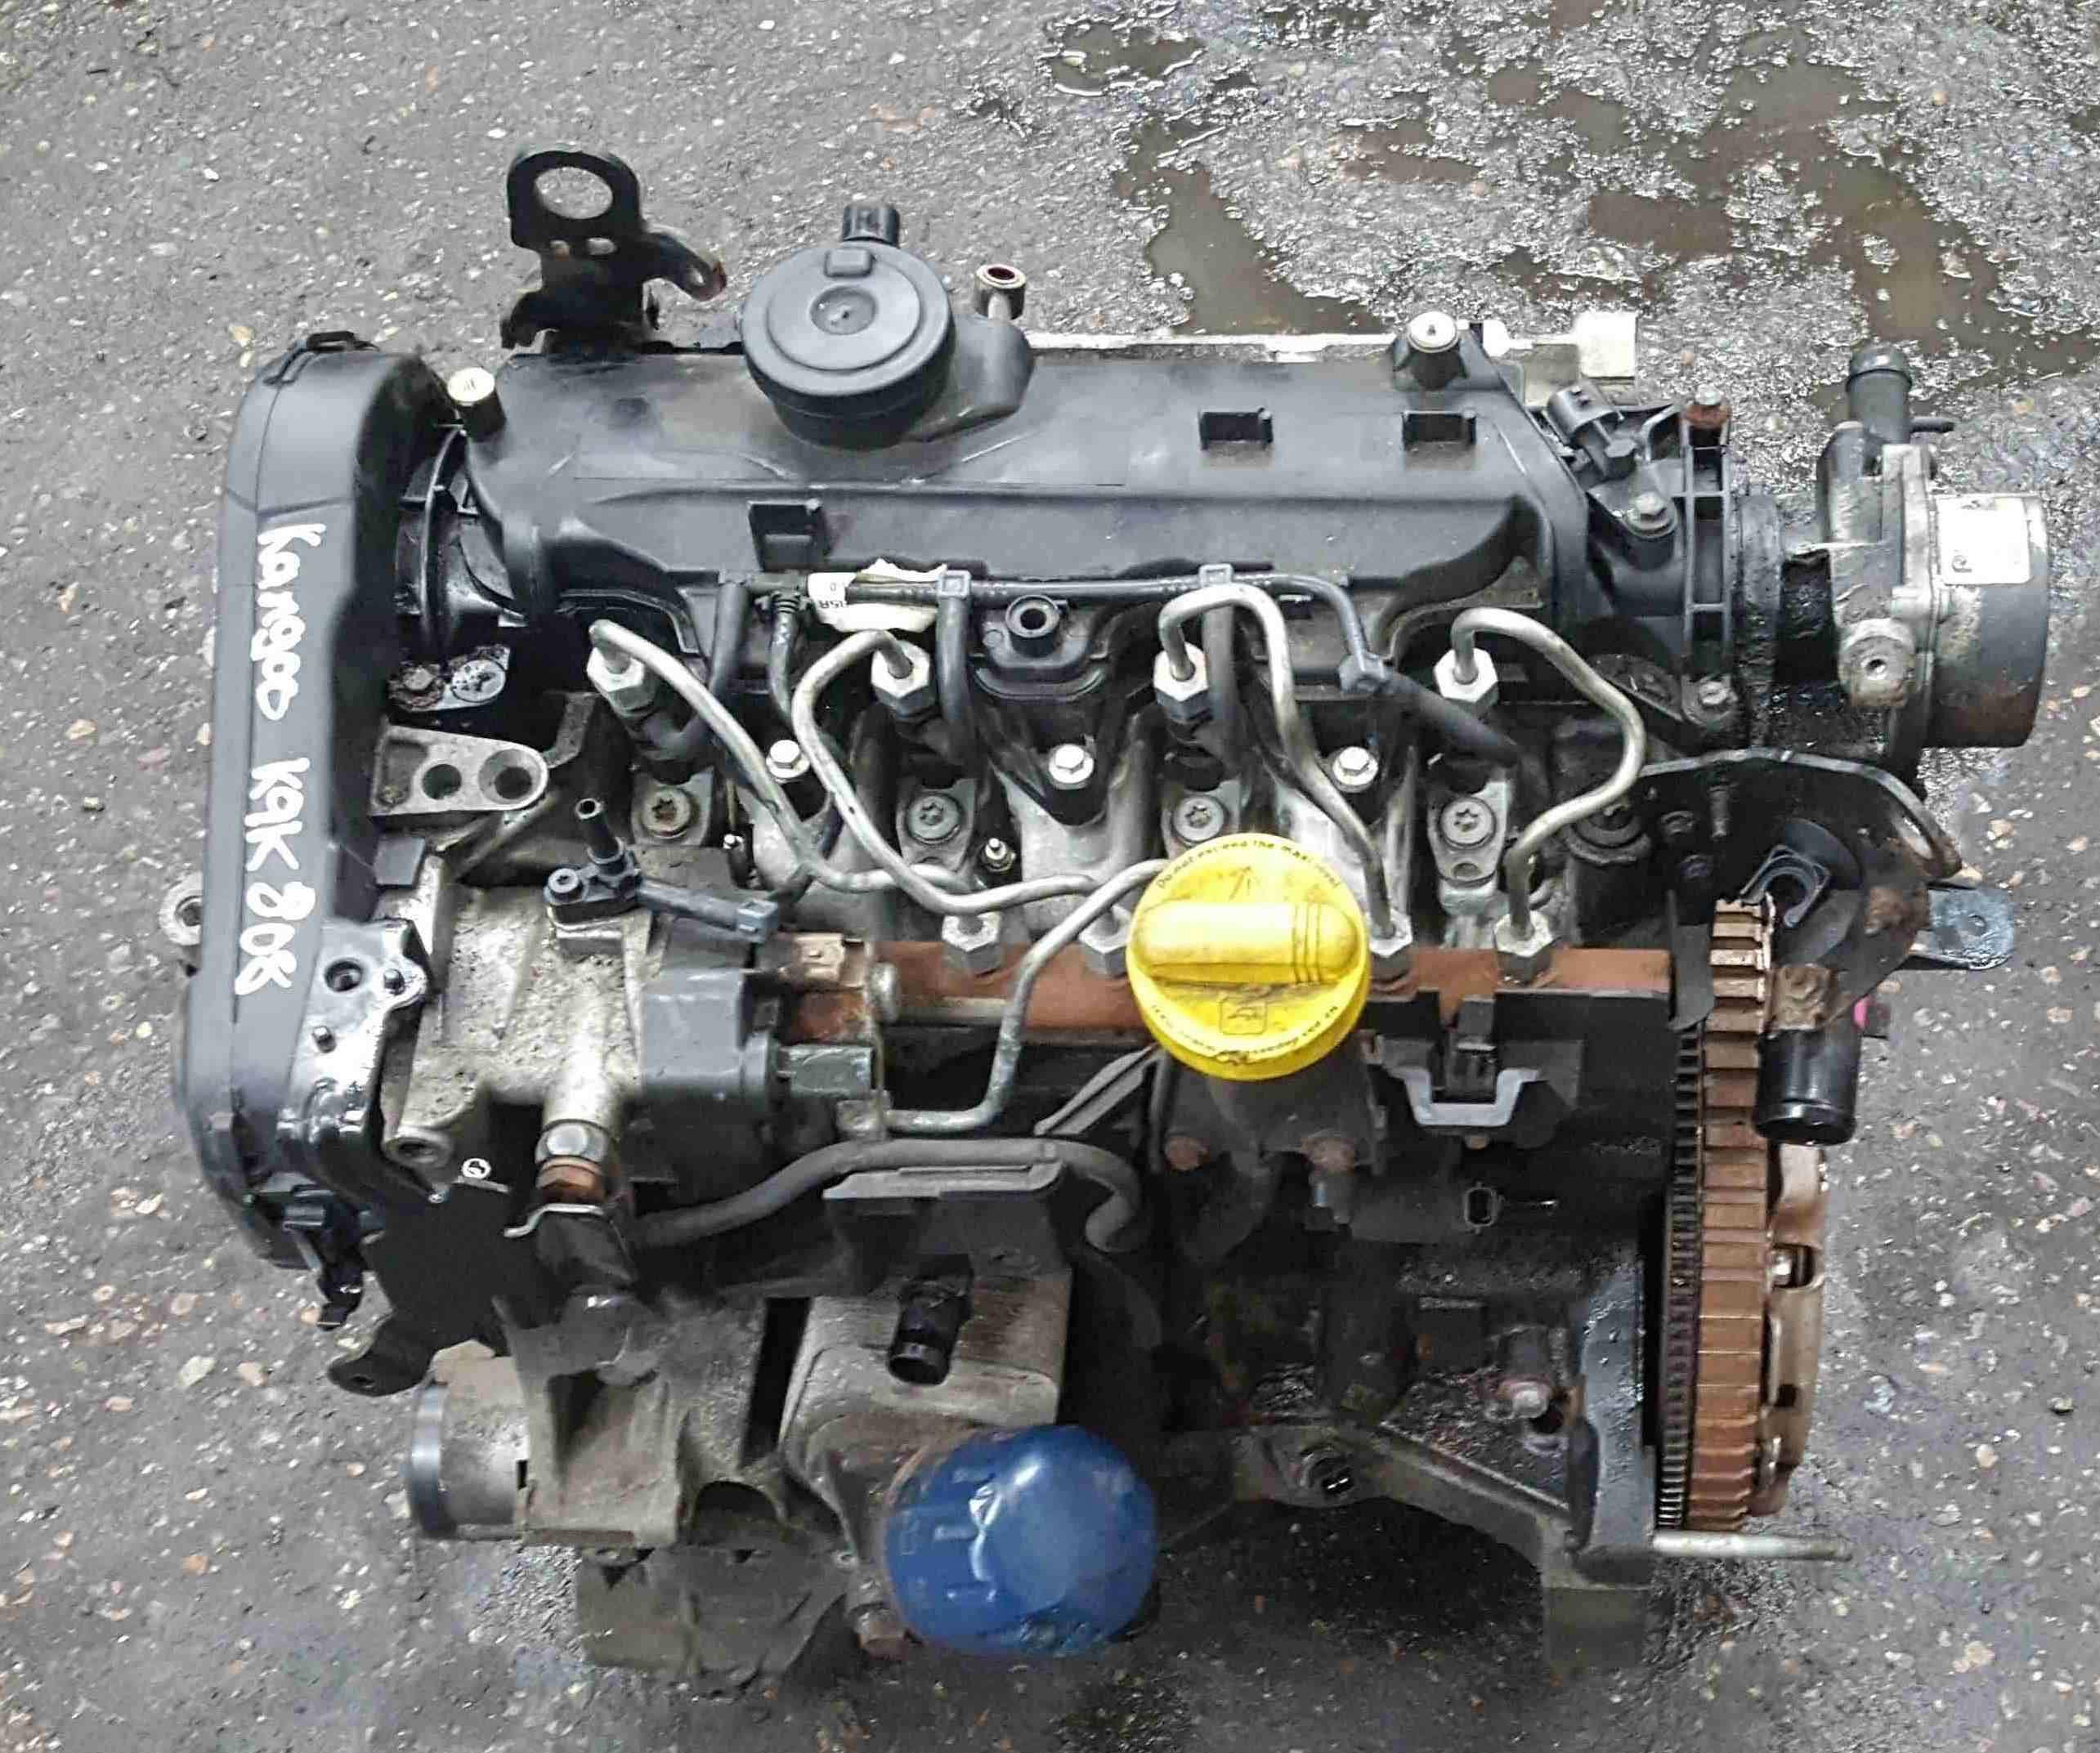 Renault Kangoo 2007-2017 1.5 DCi Diesel Engine K9K 808 3 Months Warranty k9k808